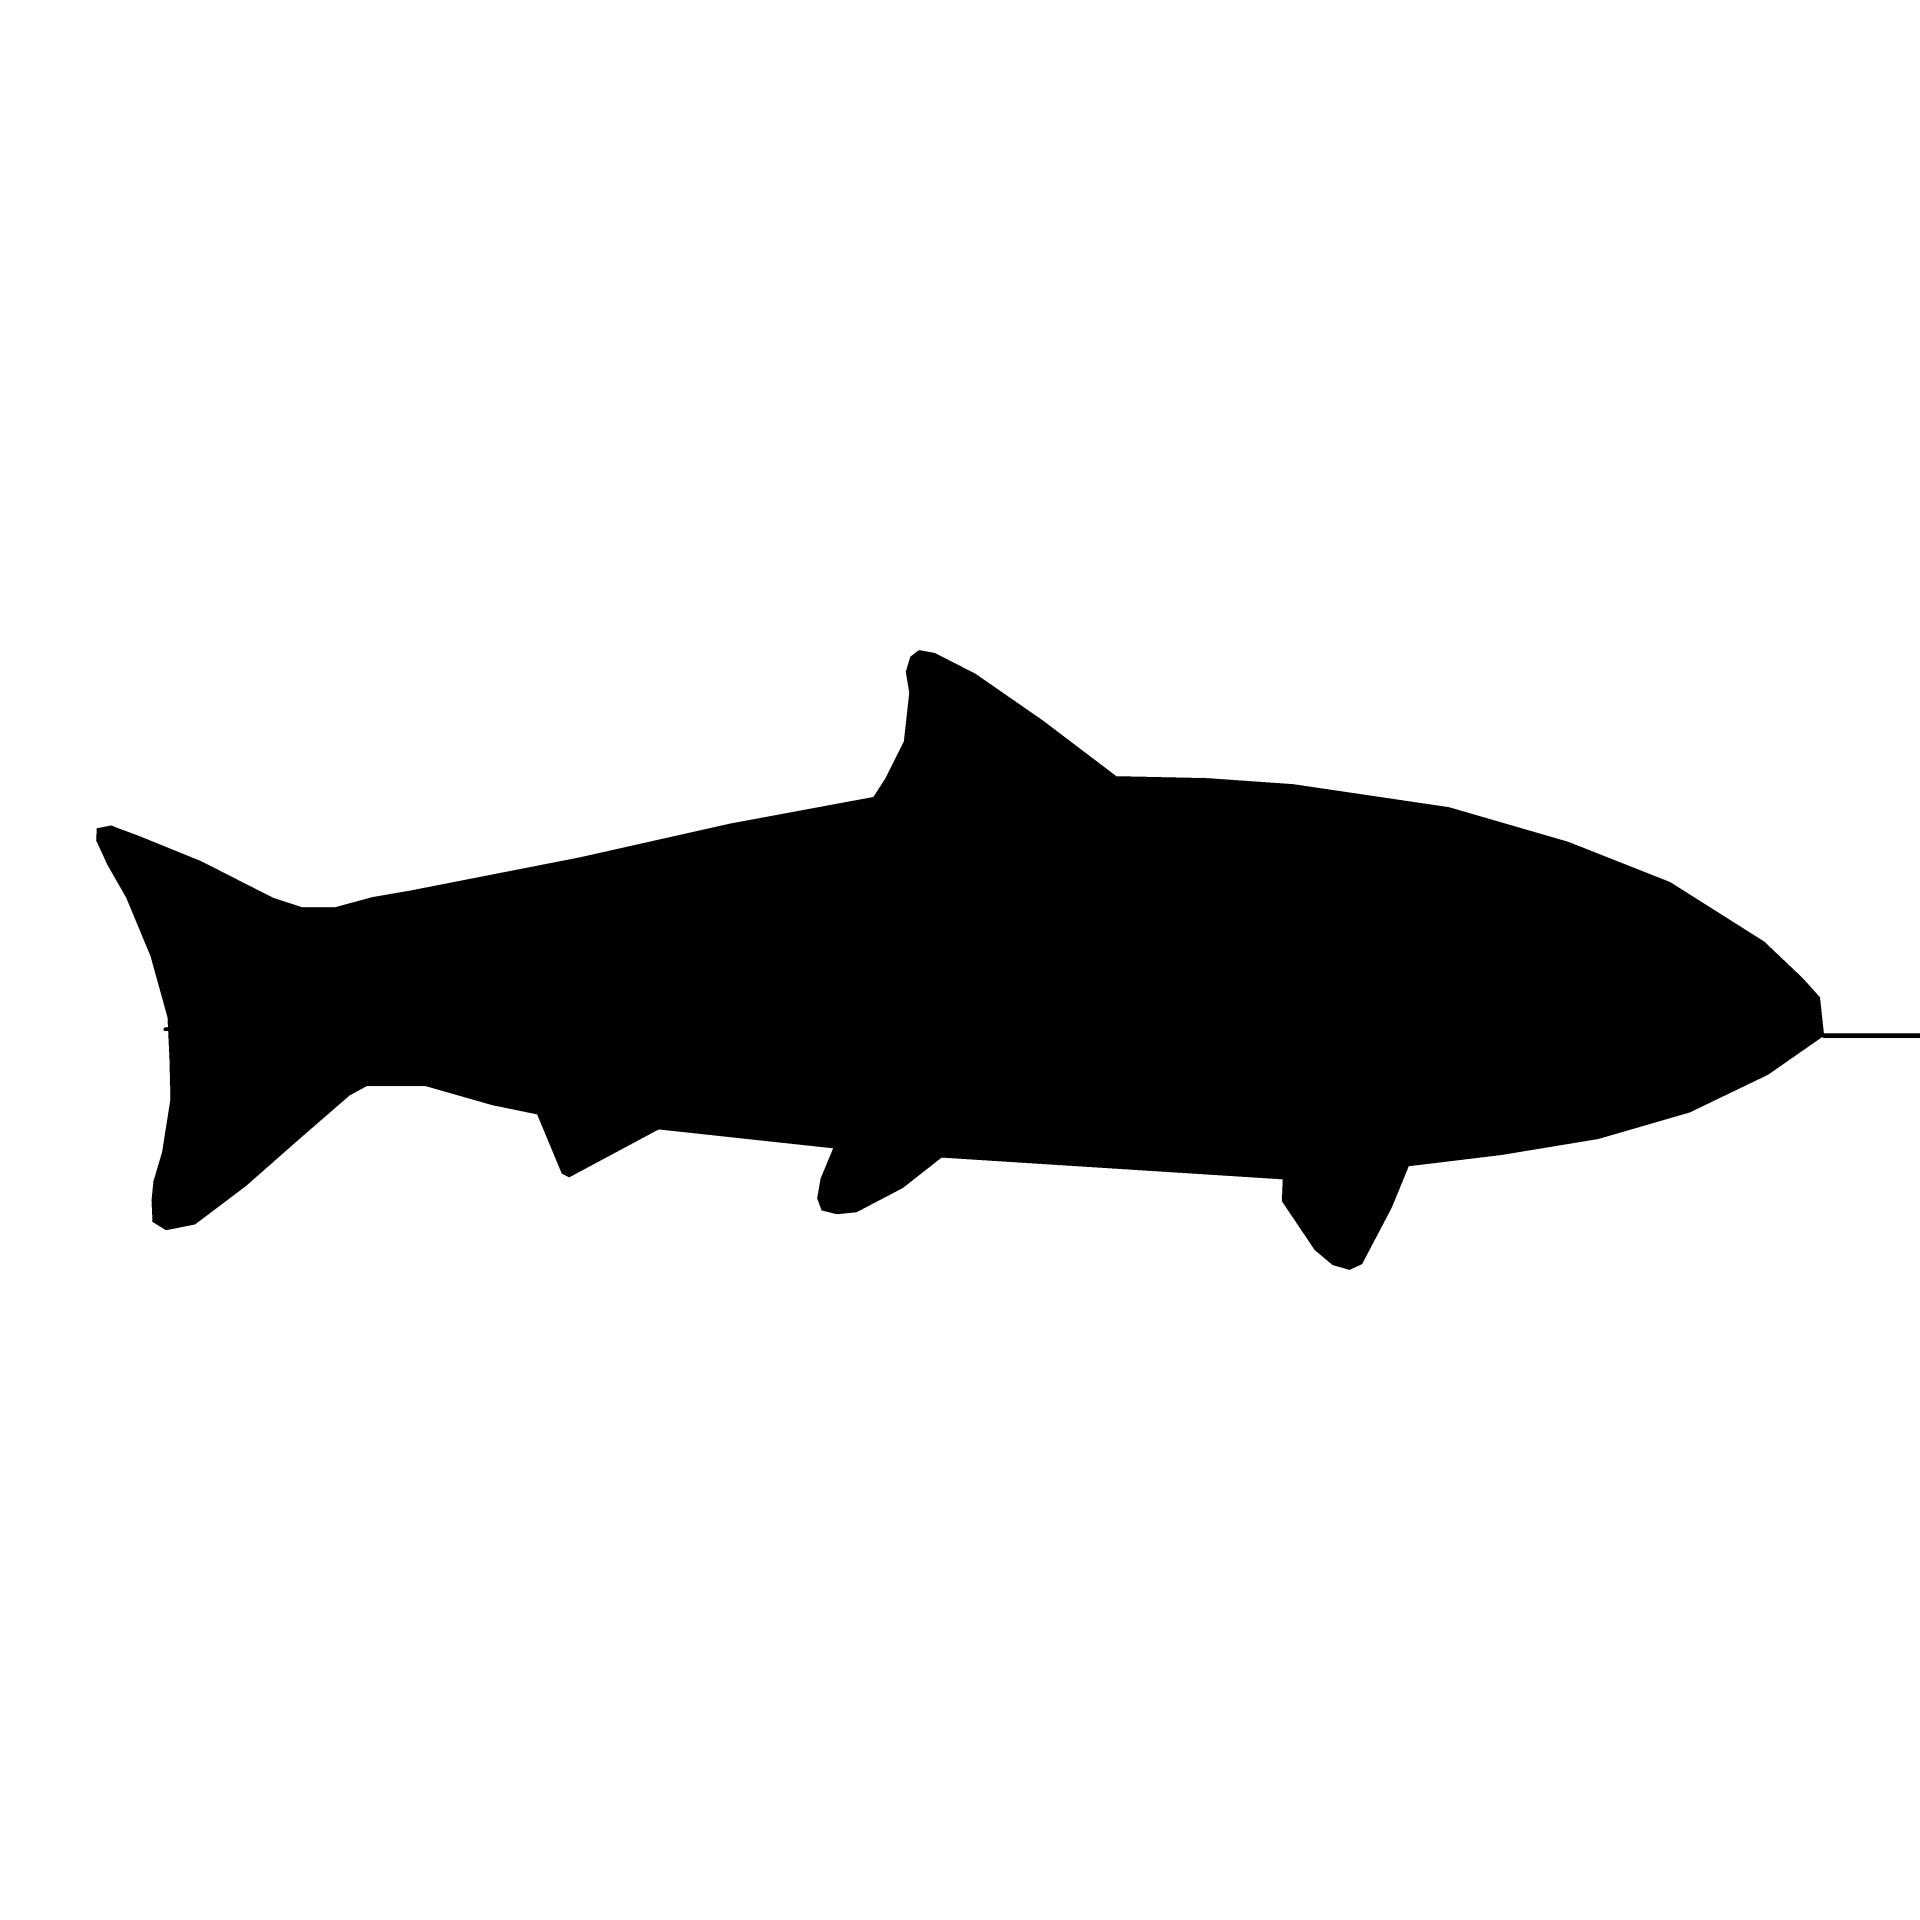 1920x1920 Fish Silhouette Free Stock Photo